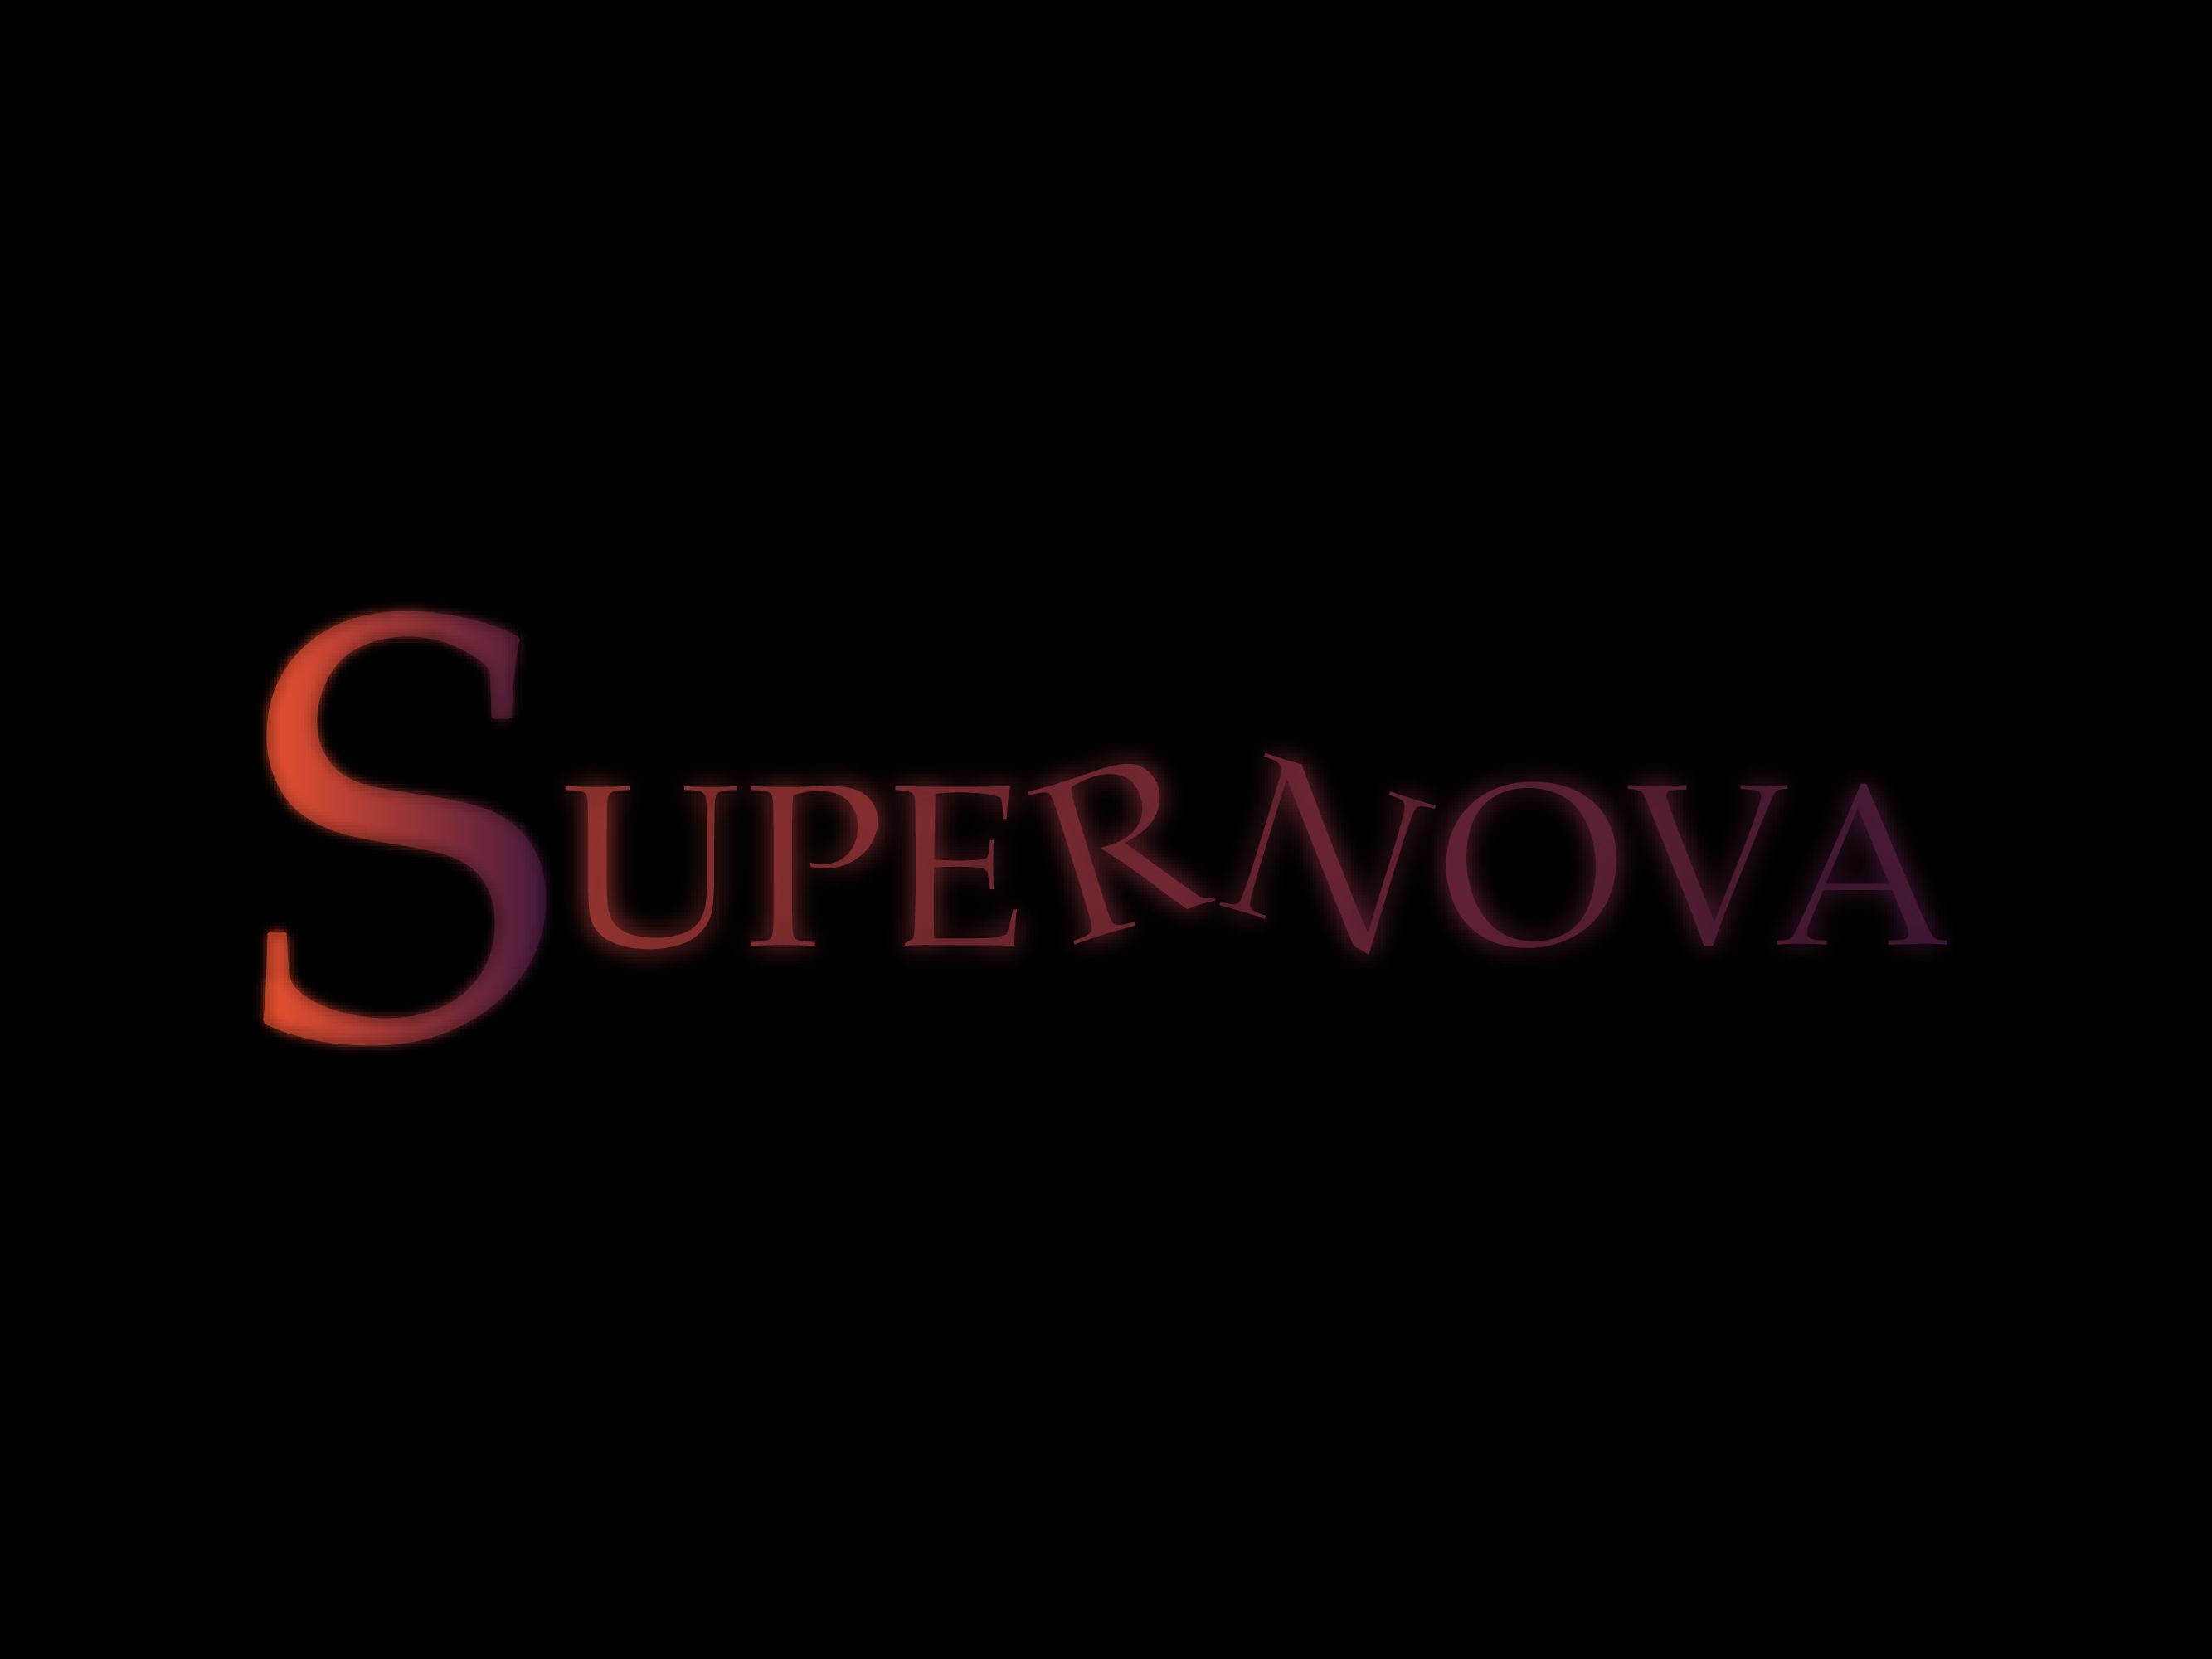 Logo Design by Inno - Entry No. 26 in the Logo Design Contest Creative Logo Design for Supernova.